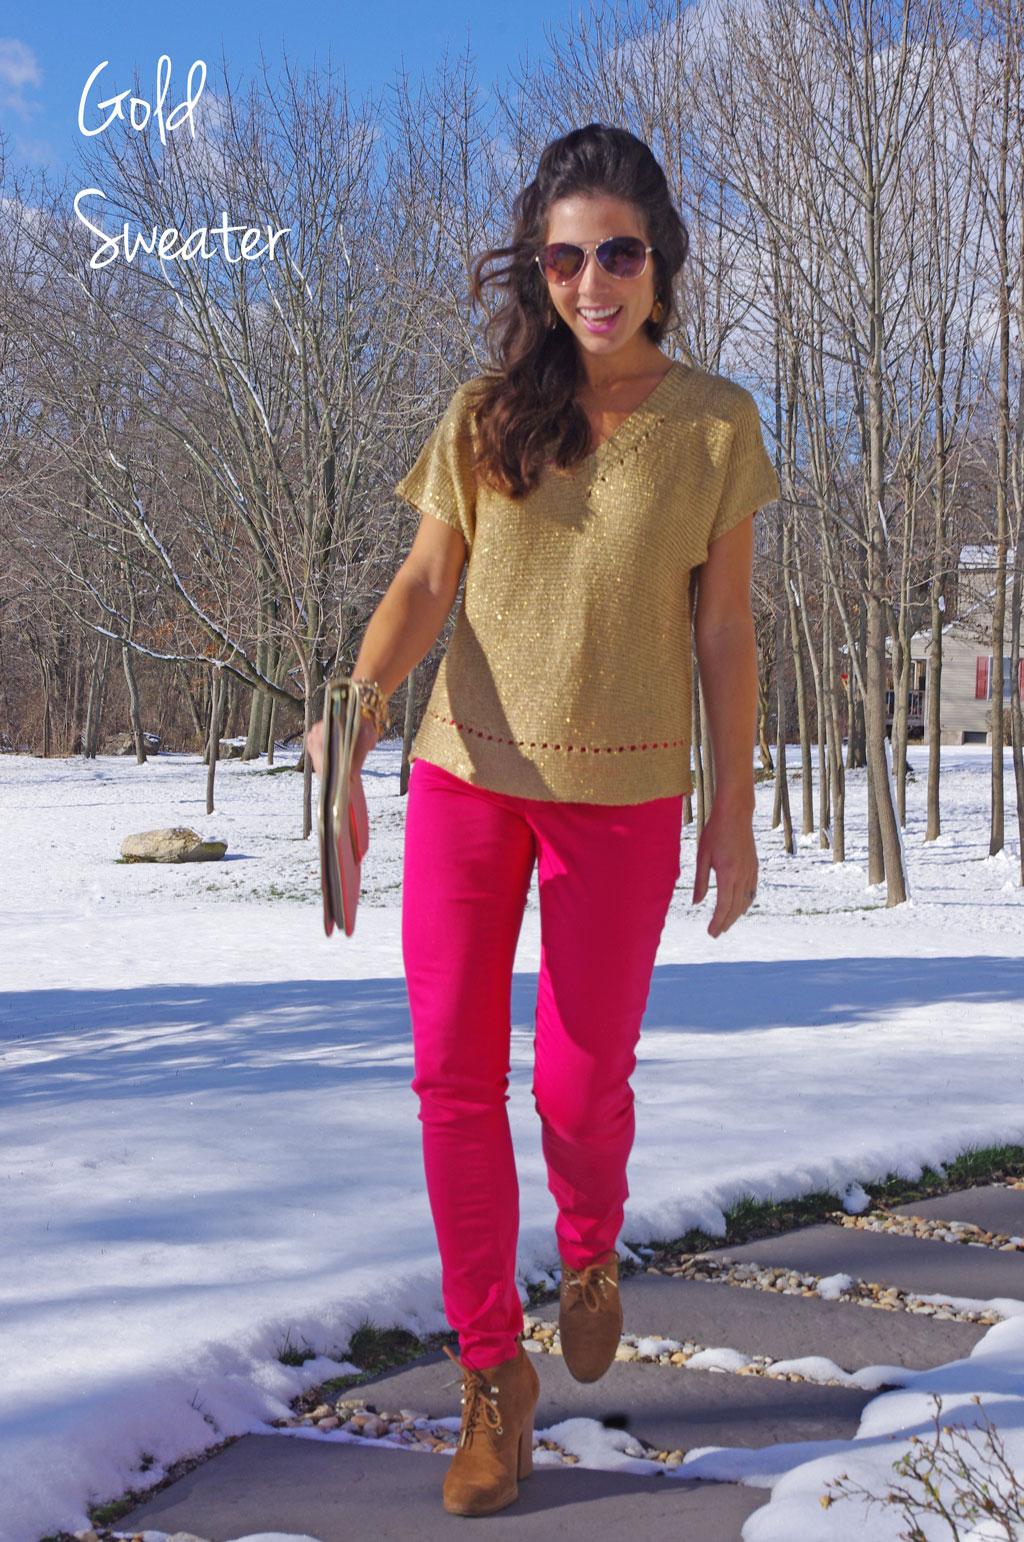 goldsweatermain